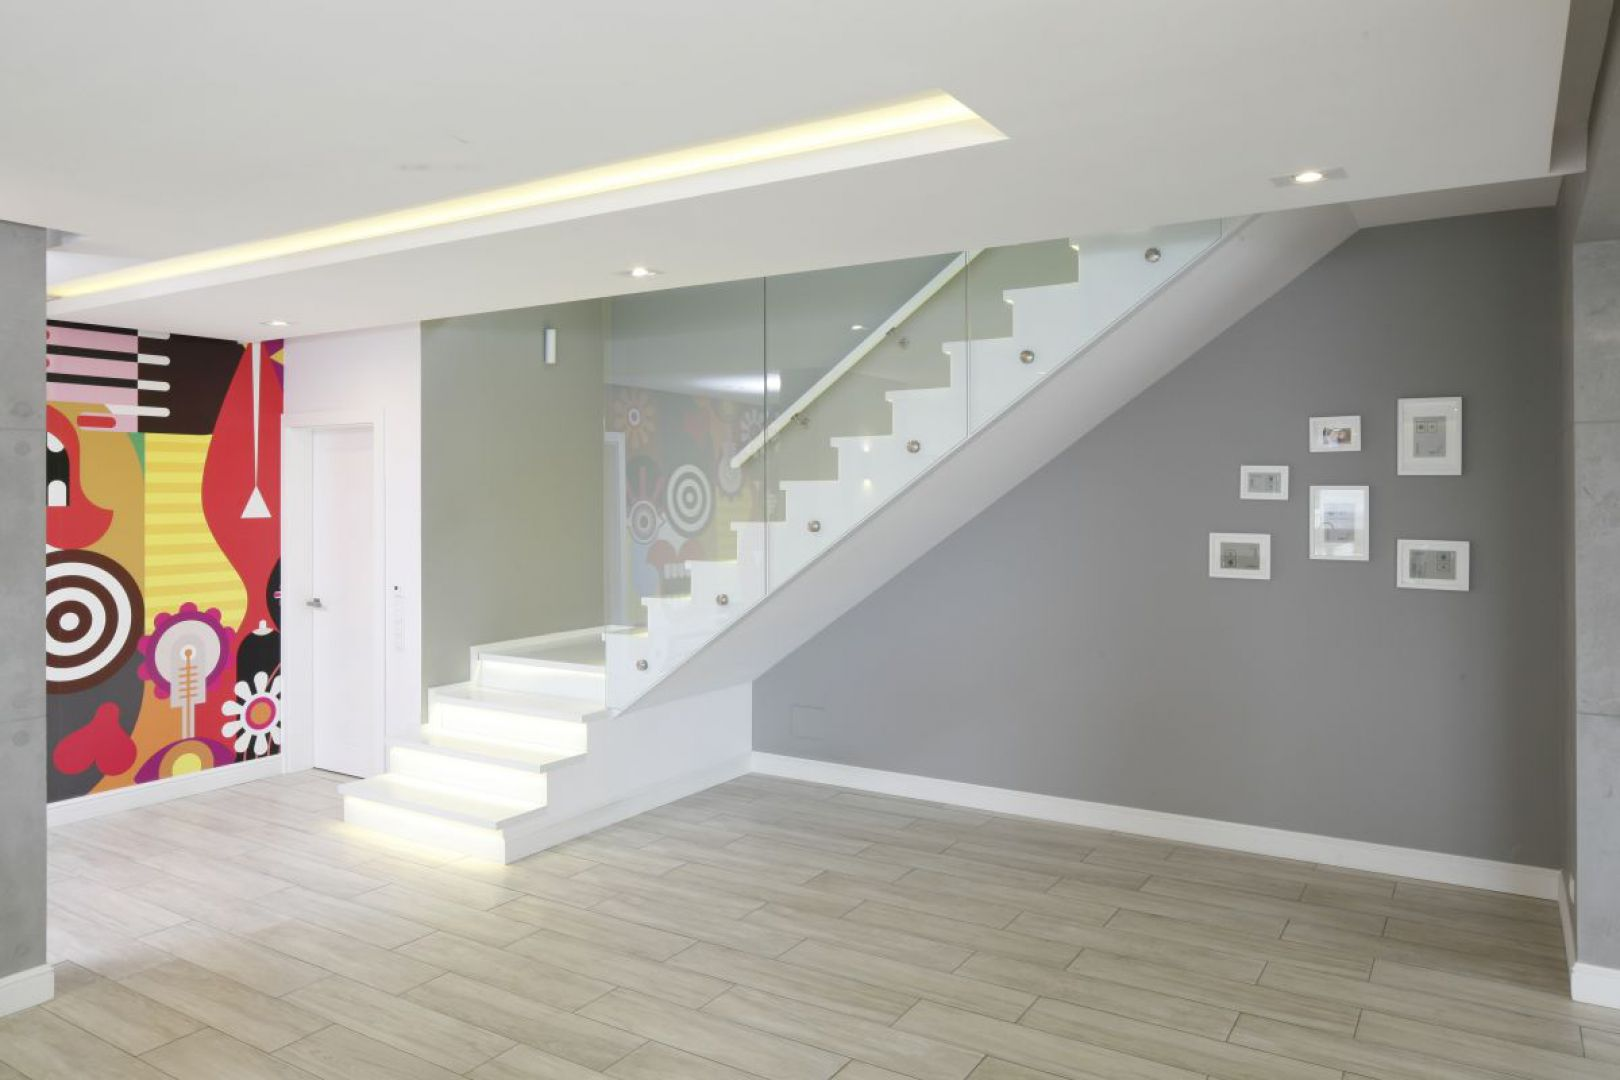 Pomysł na schody ze szklaną balustradą. Projekt: Dominik Respondek. Fot. Bartosz Jarosz